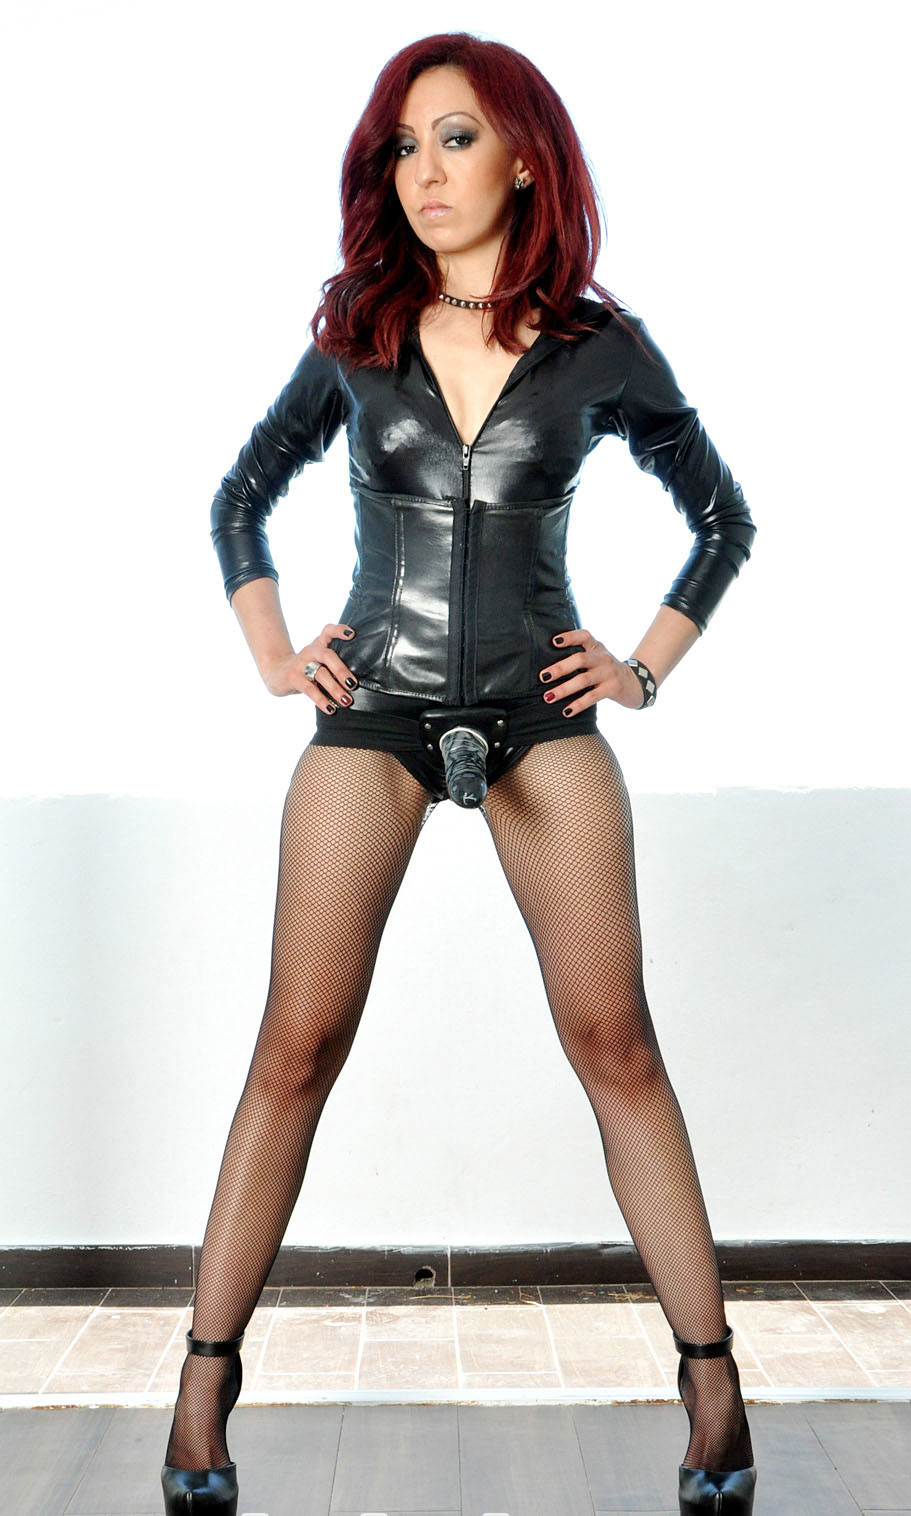 naked redhead dominatrix lesbians